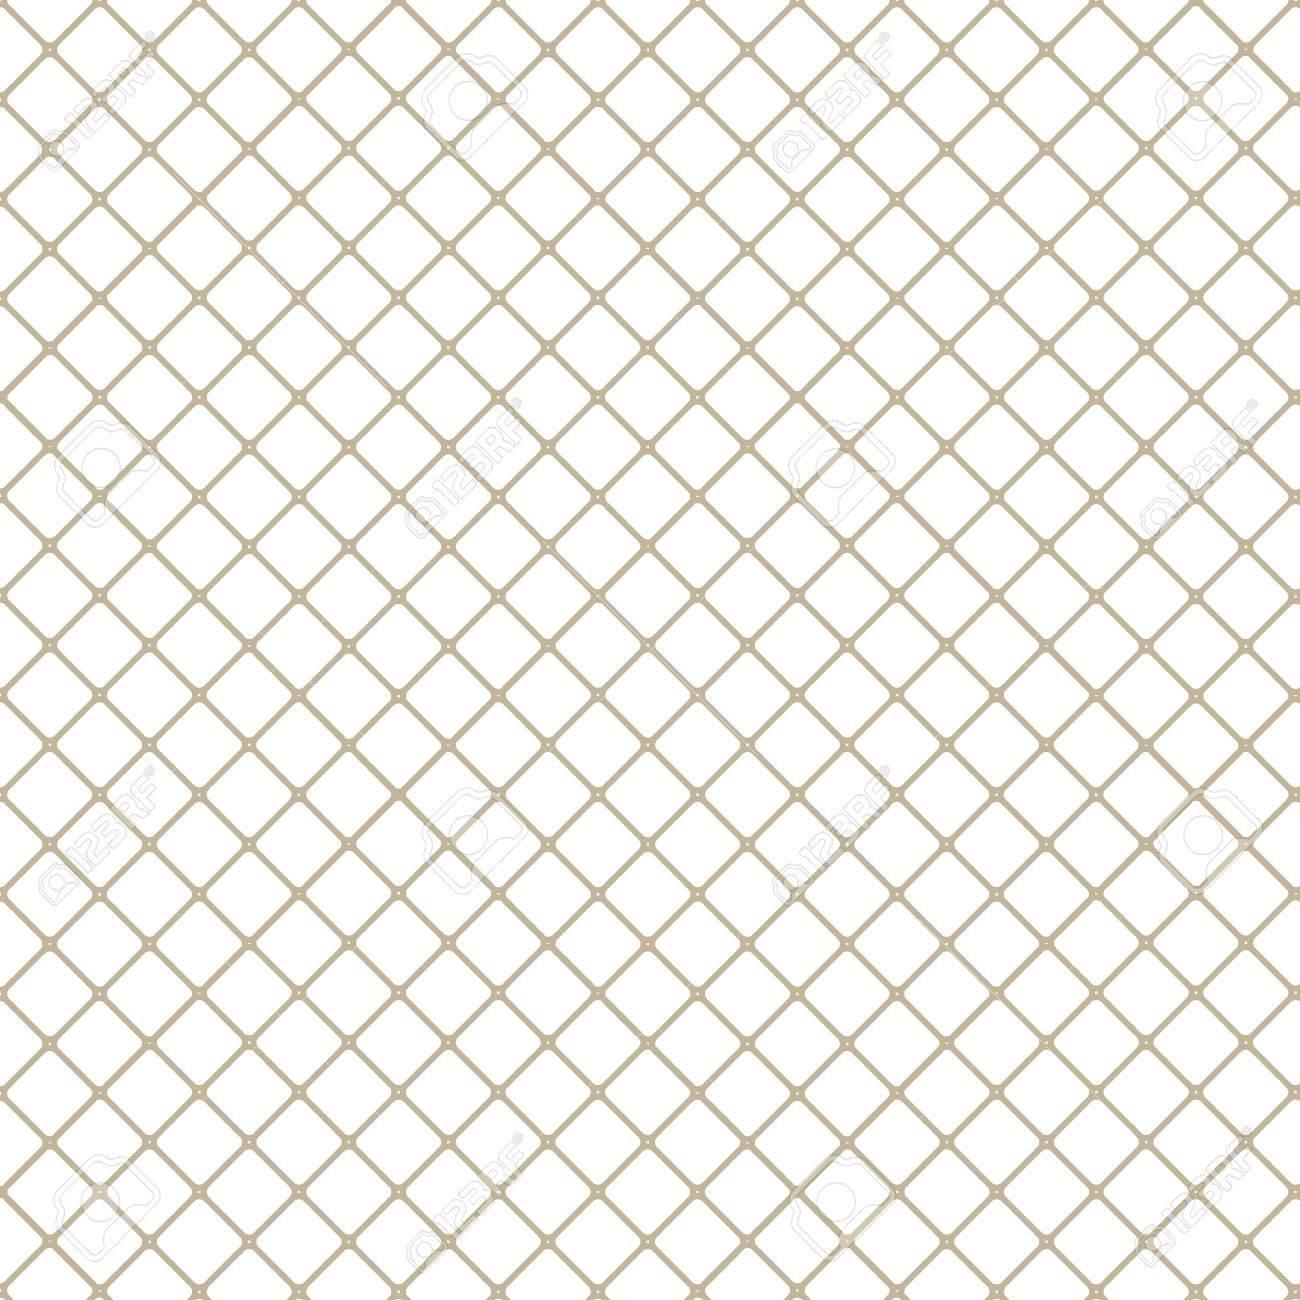 1300x1300 Seamless Pattern Mesh Line. Texture Mesh Line, Lattice Grid